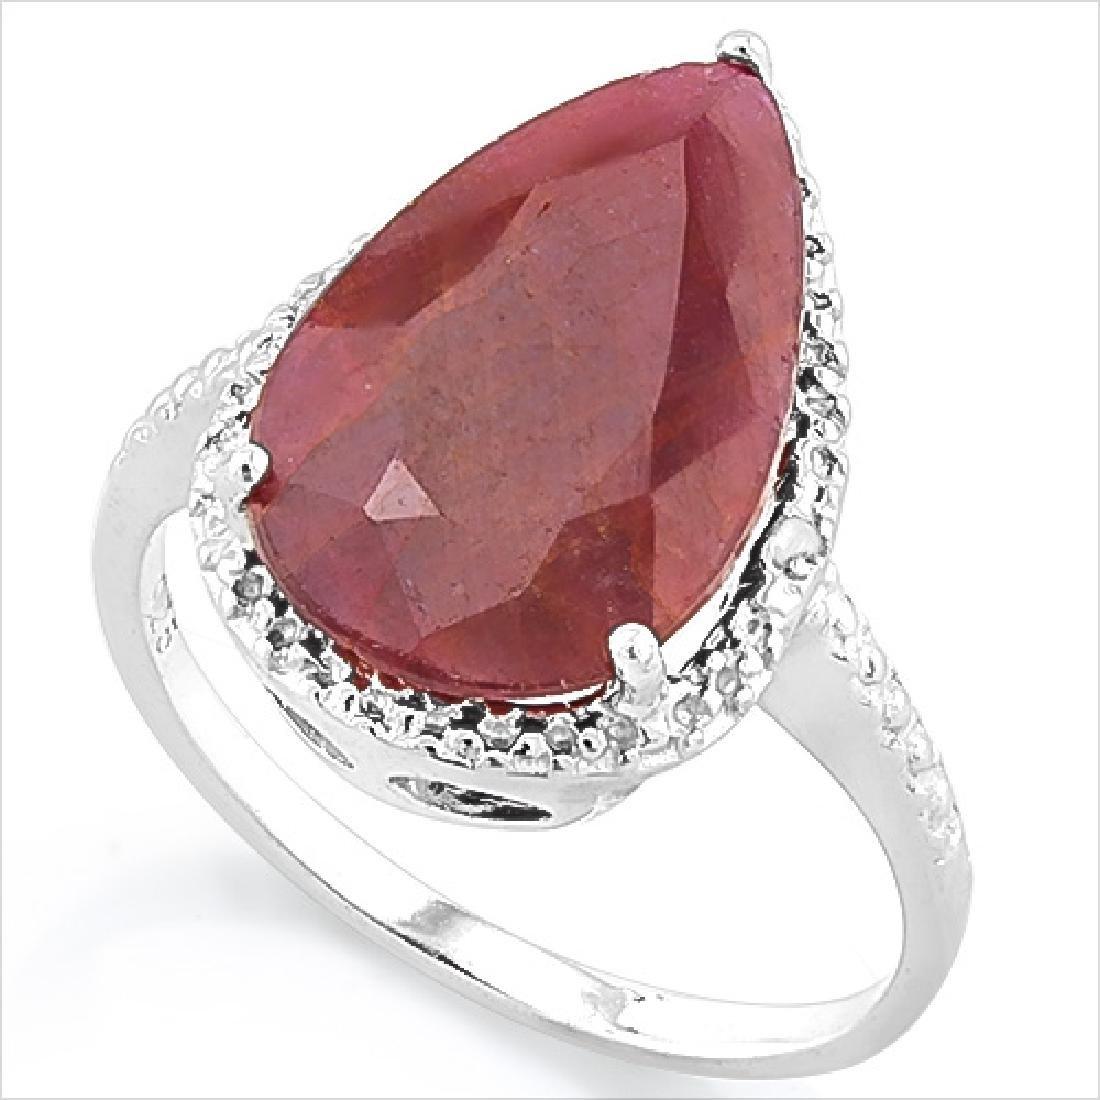 SPARKLING PEAR CUT 6CT GENUINE RUBY/DIAMOND RING